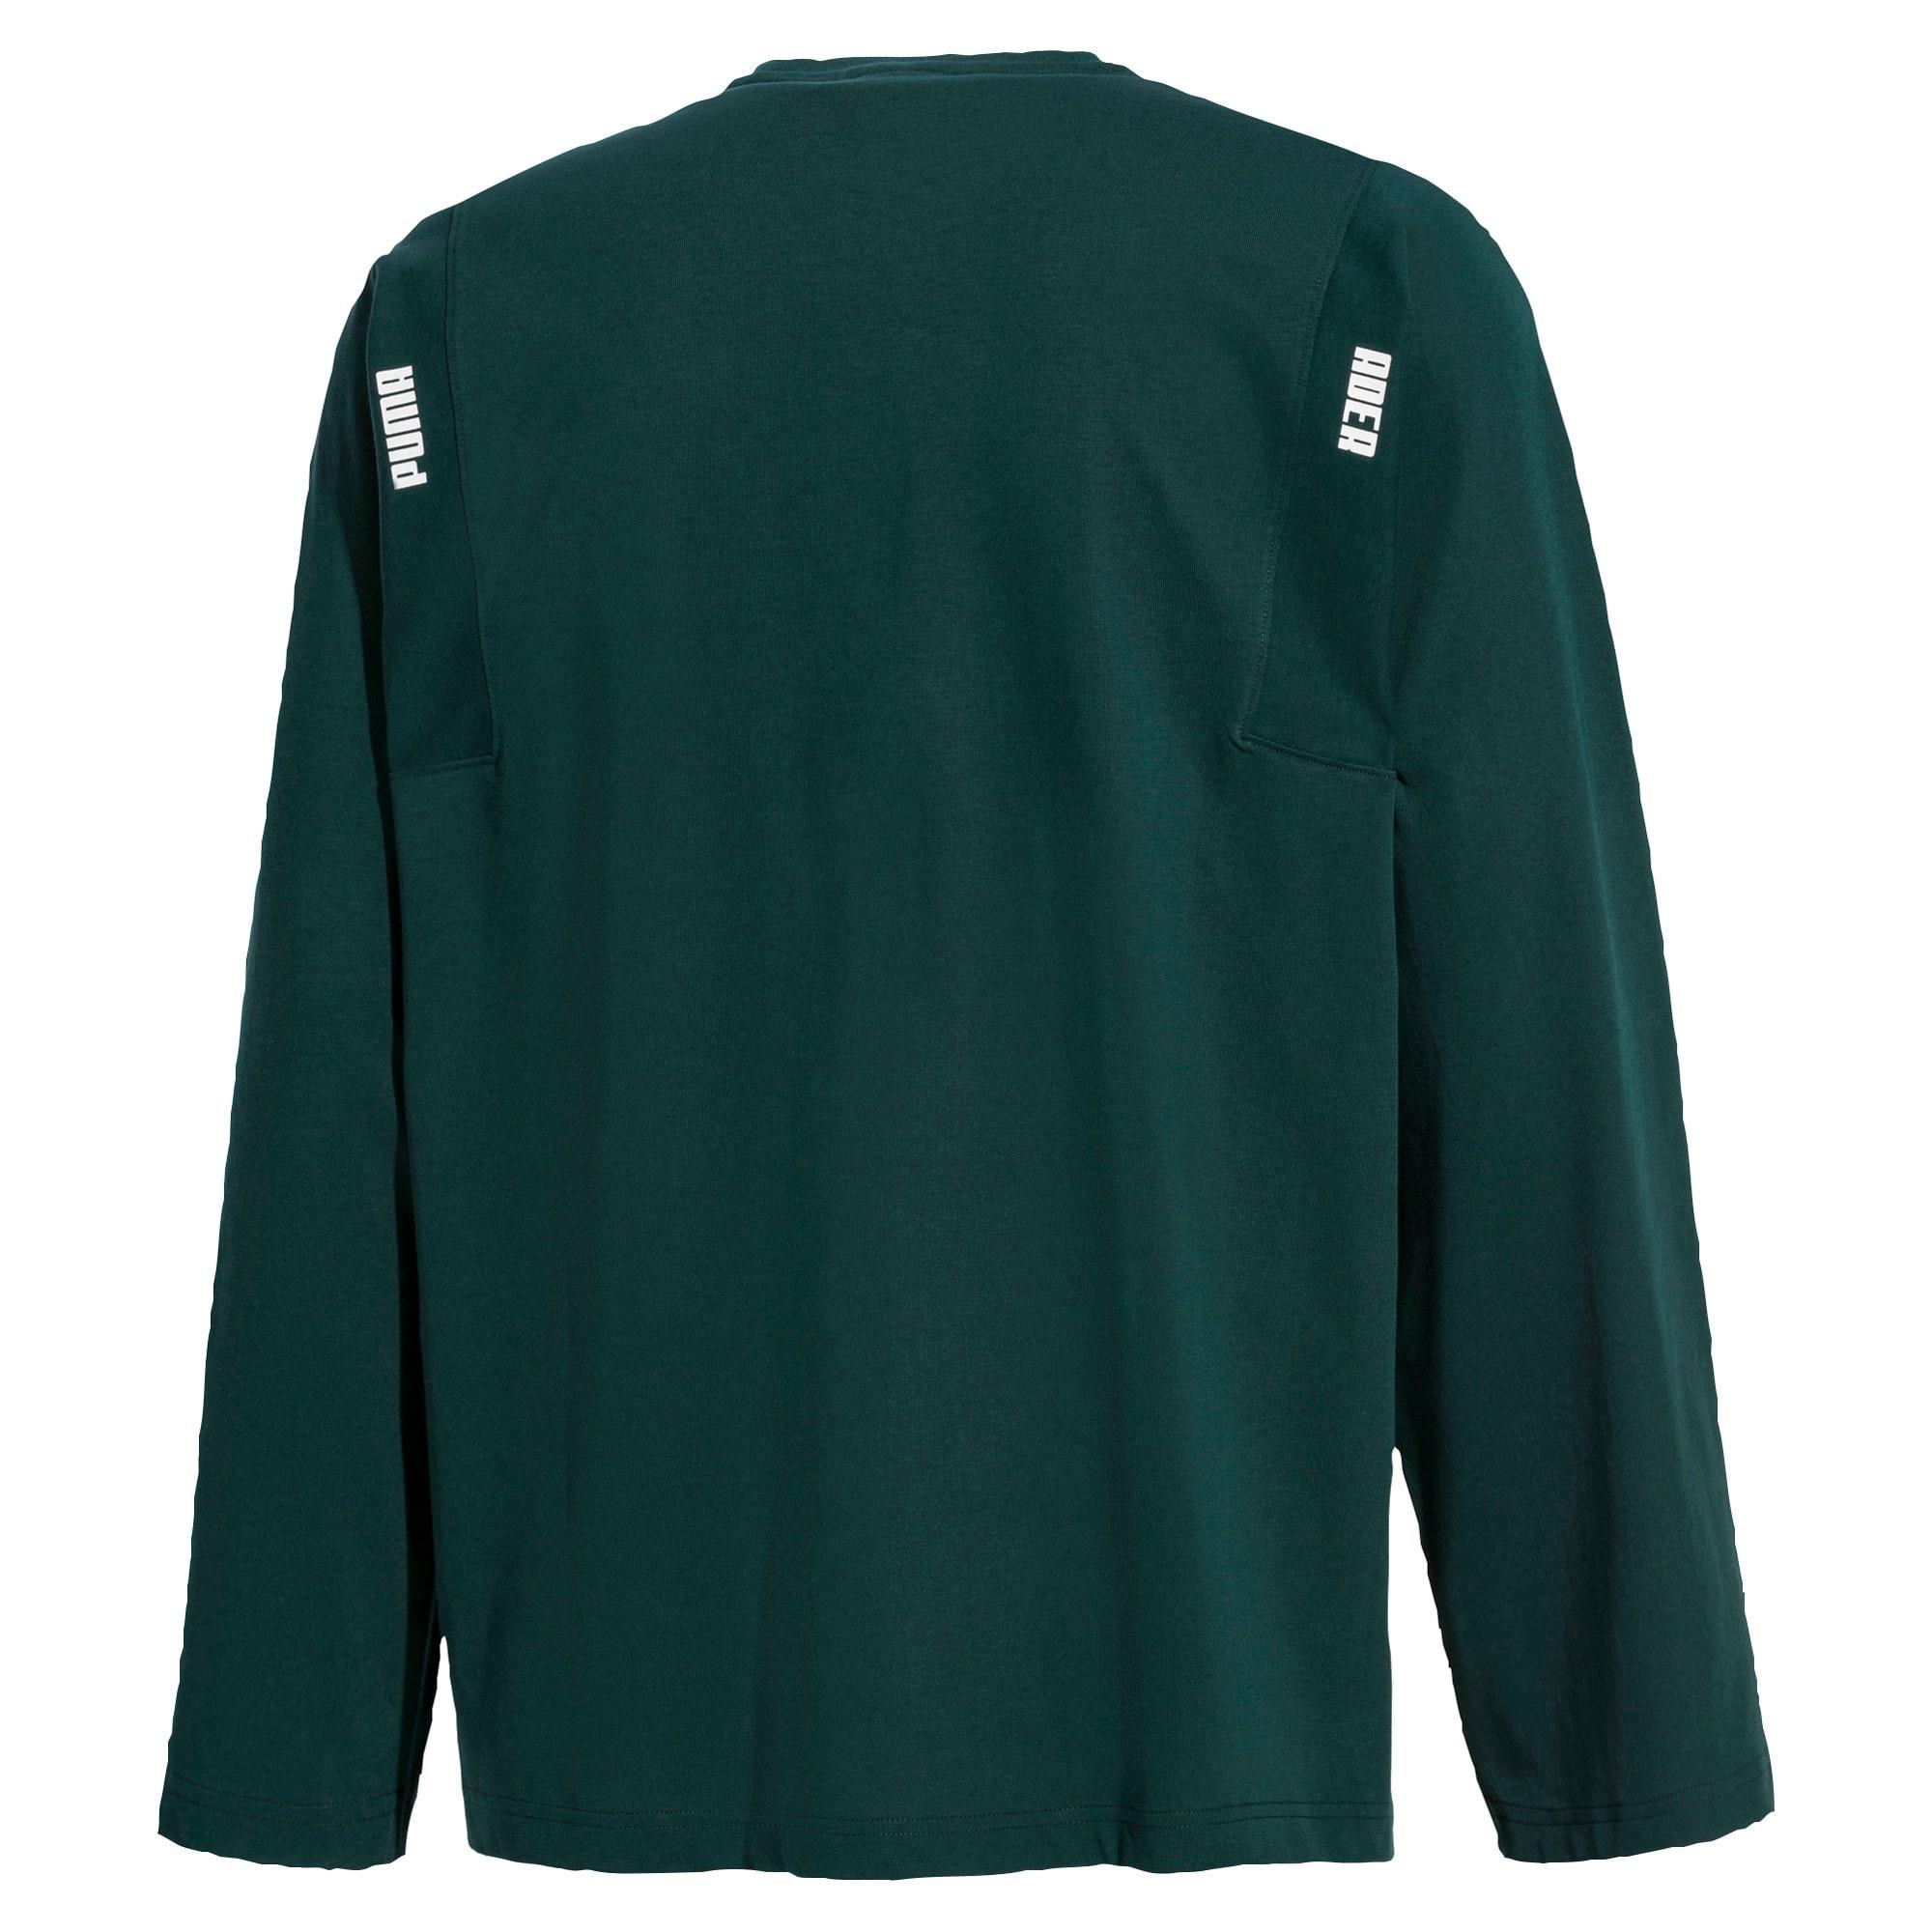 Thumbnail 4 of PUMA x ADER ERROR Langarm-Shirt, Ponderosa Pine, medium